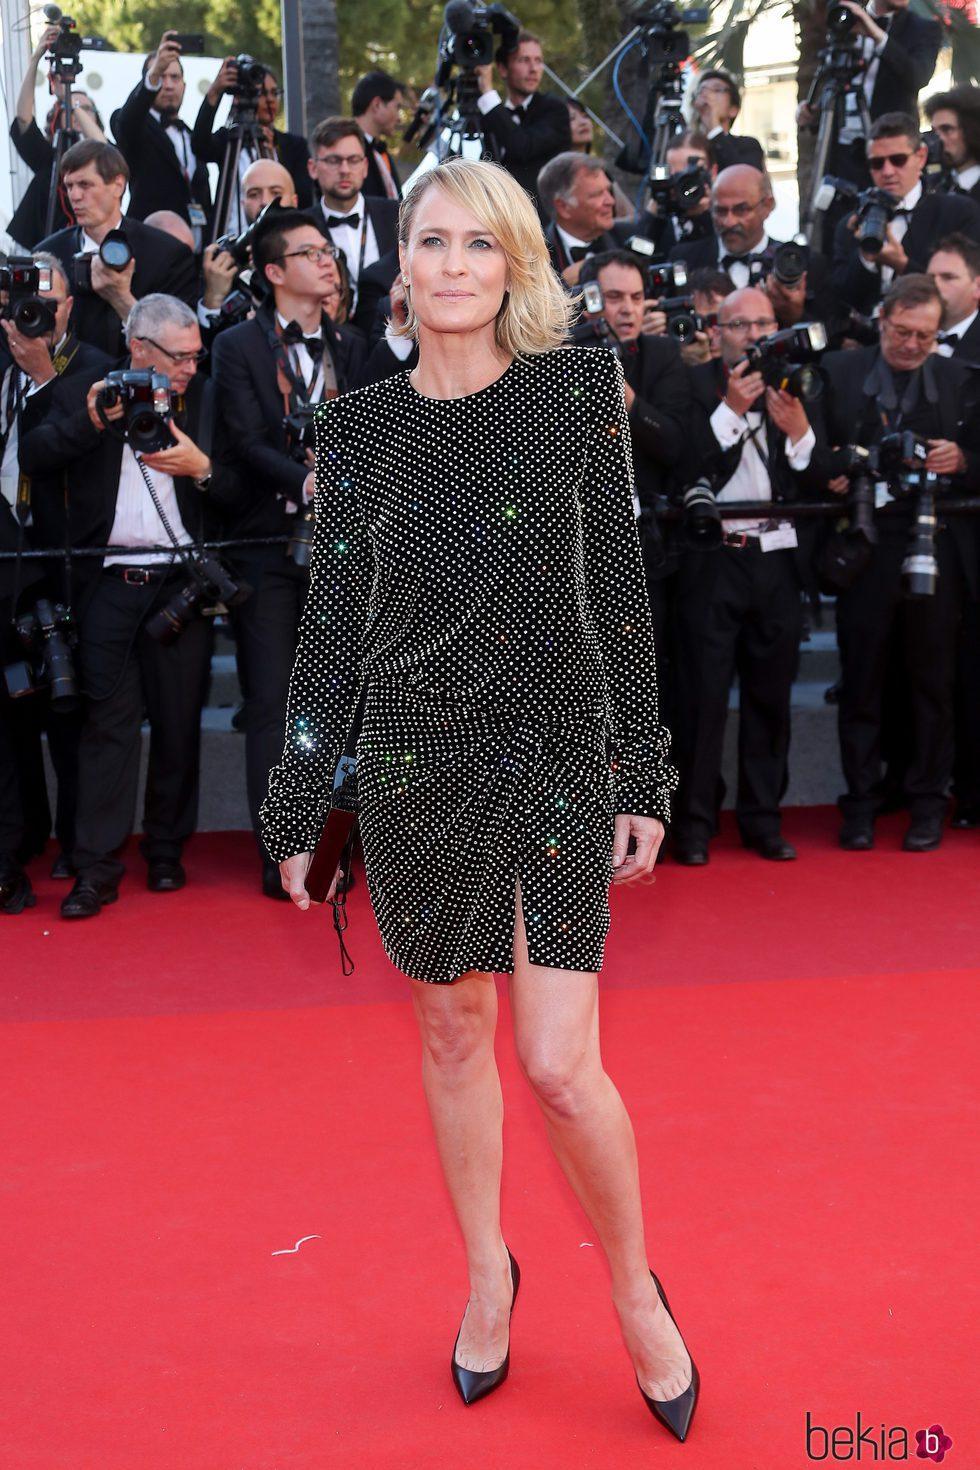 Robin Wright en la gala inaugural del Festival de Cannes 2017